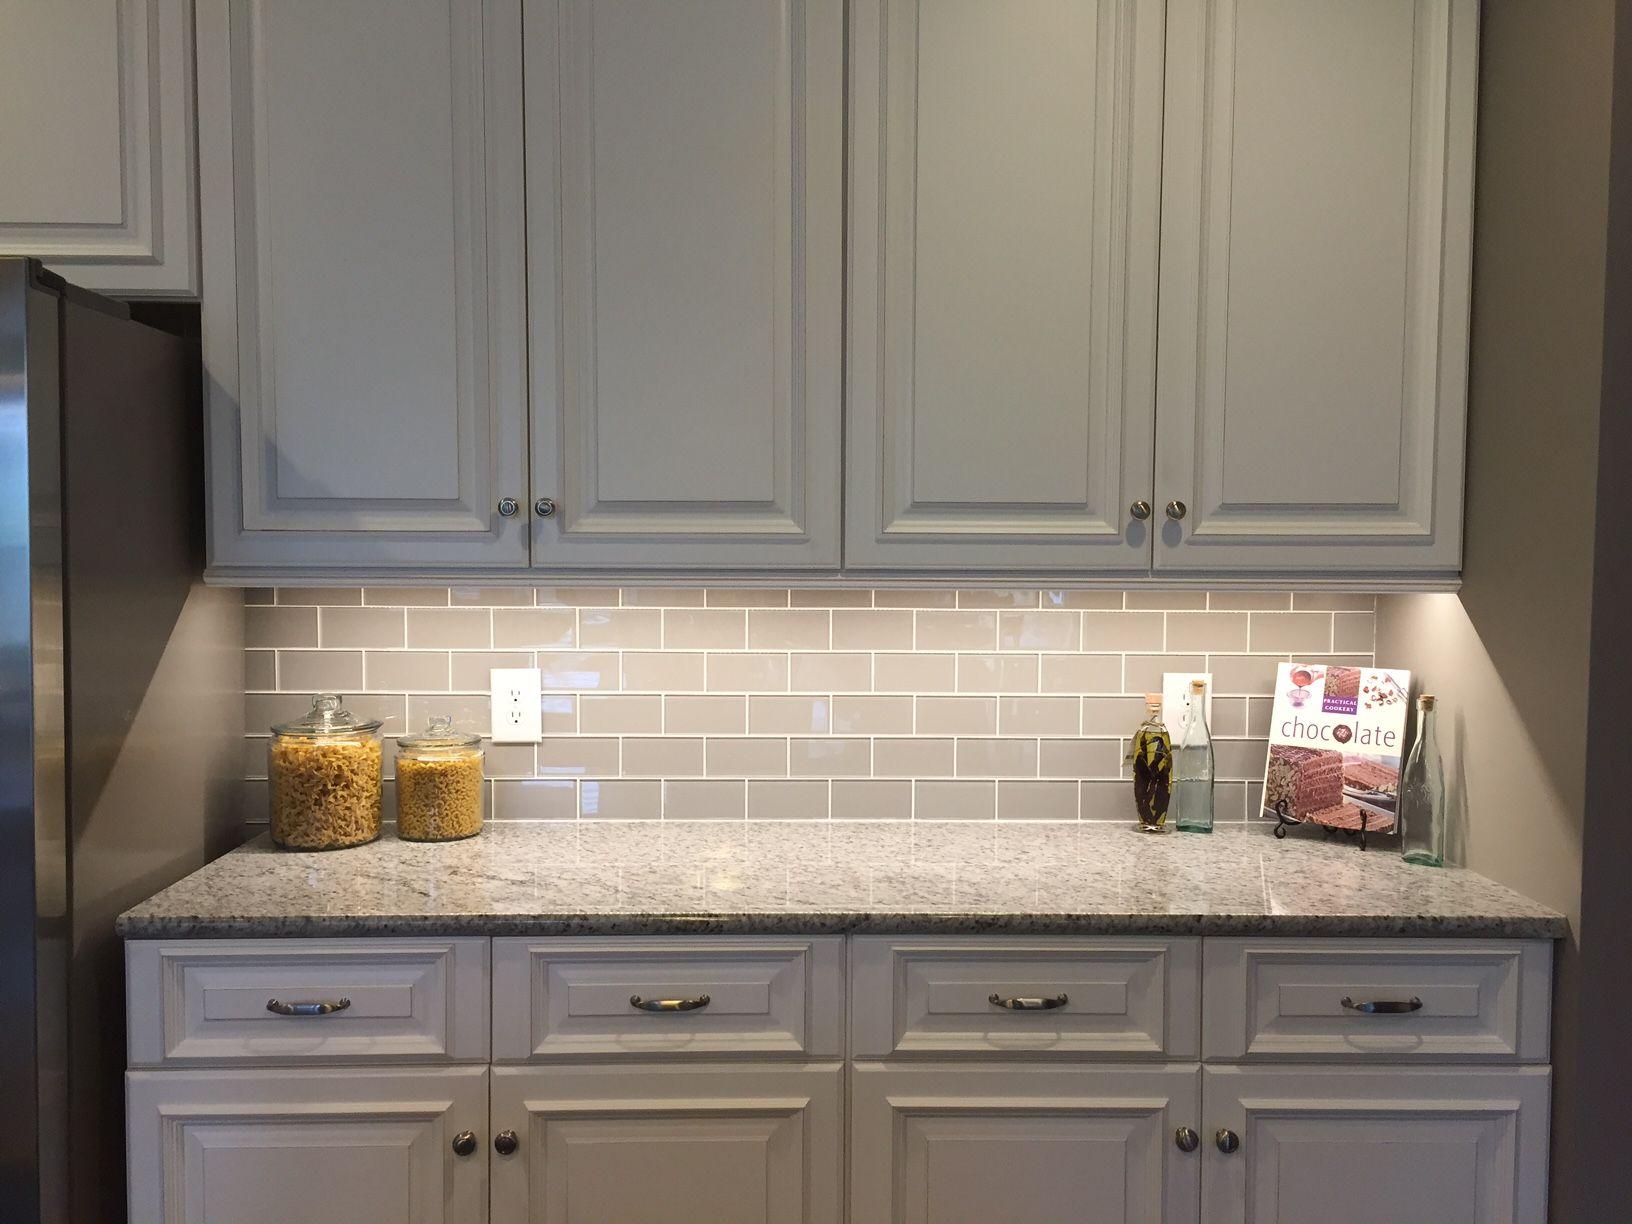 glass backsplashes for kitchens types of kitchen flooring pros and cons smoke subway tile backsplash